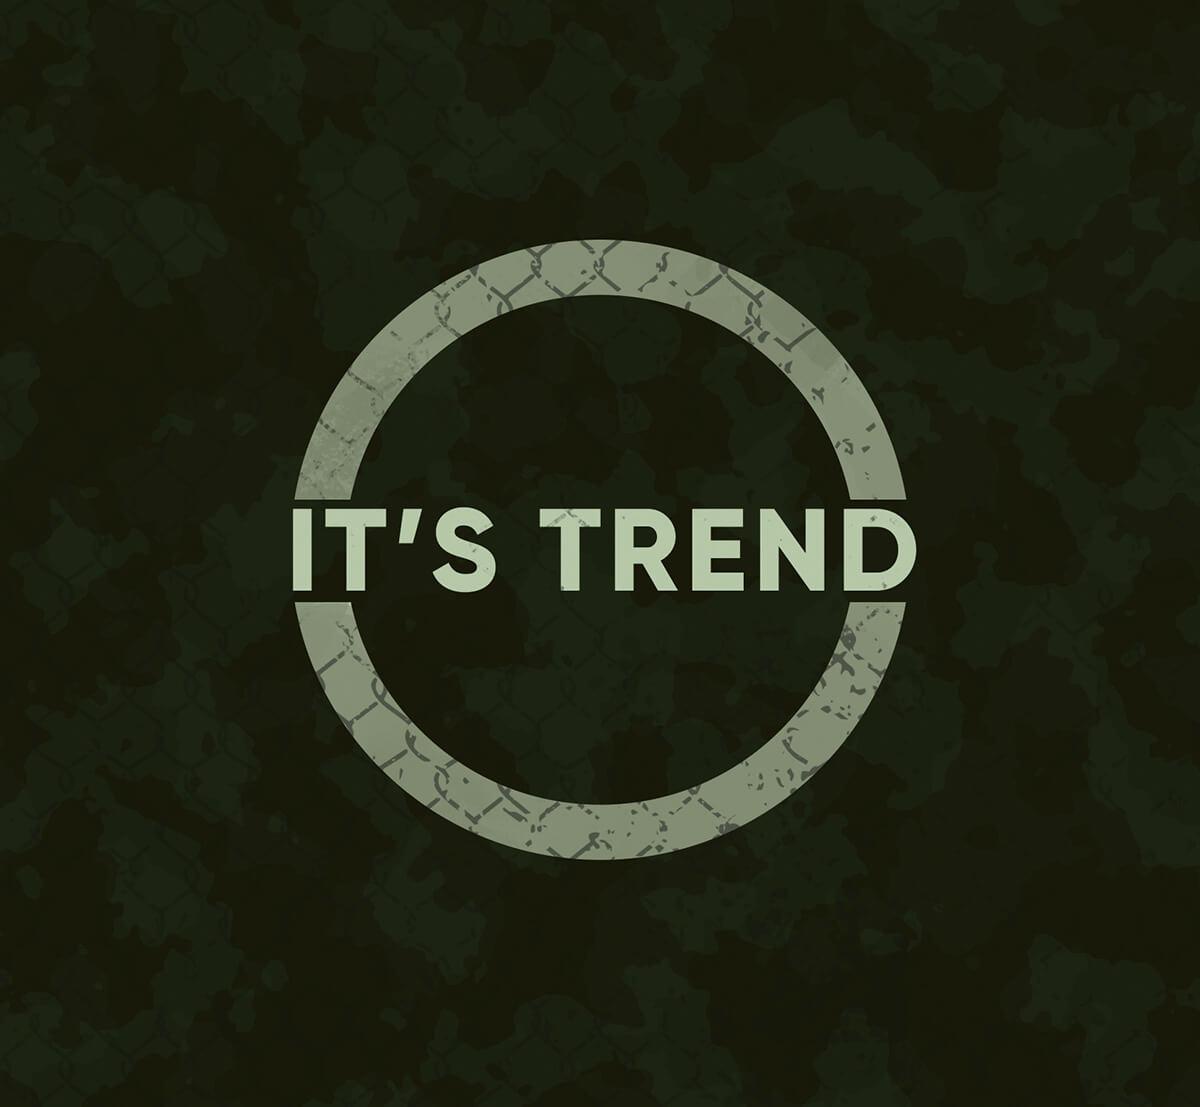 It's Trend